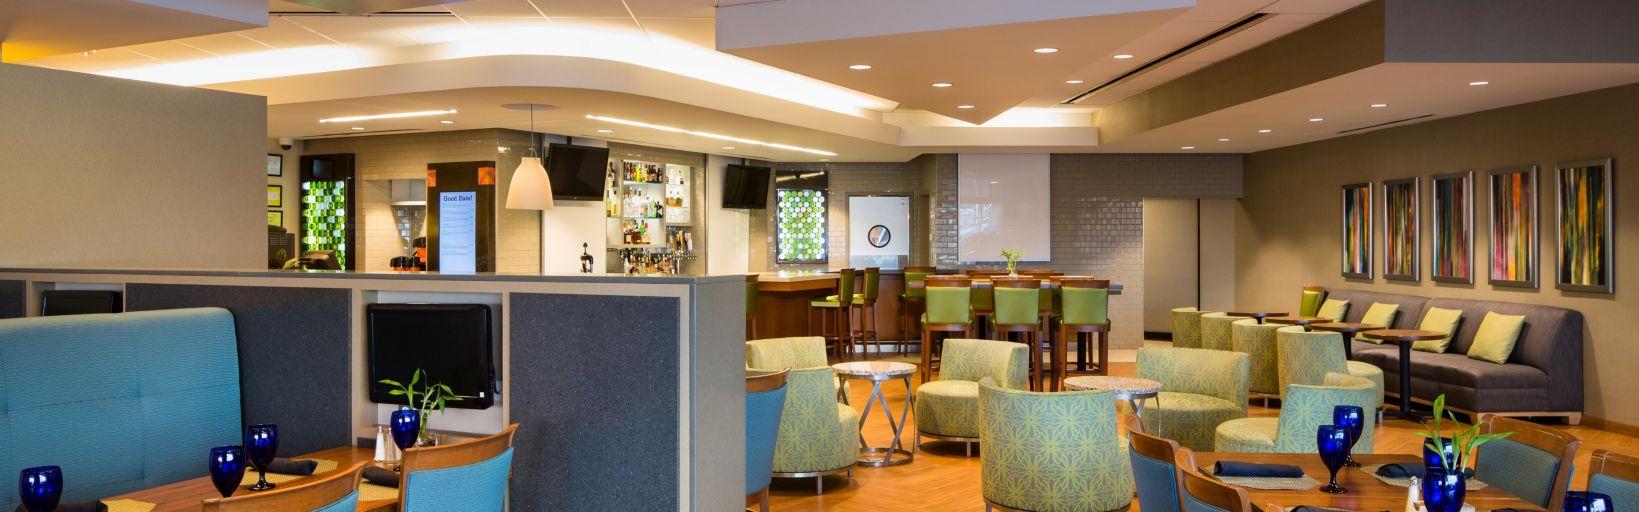 Baltimore Bwi Airport Restaurant